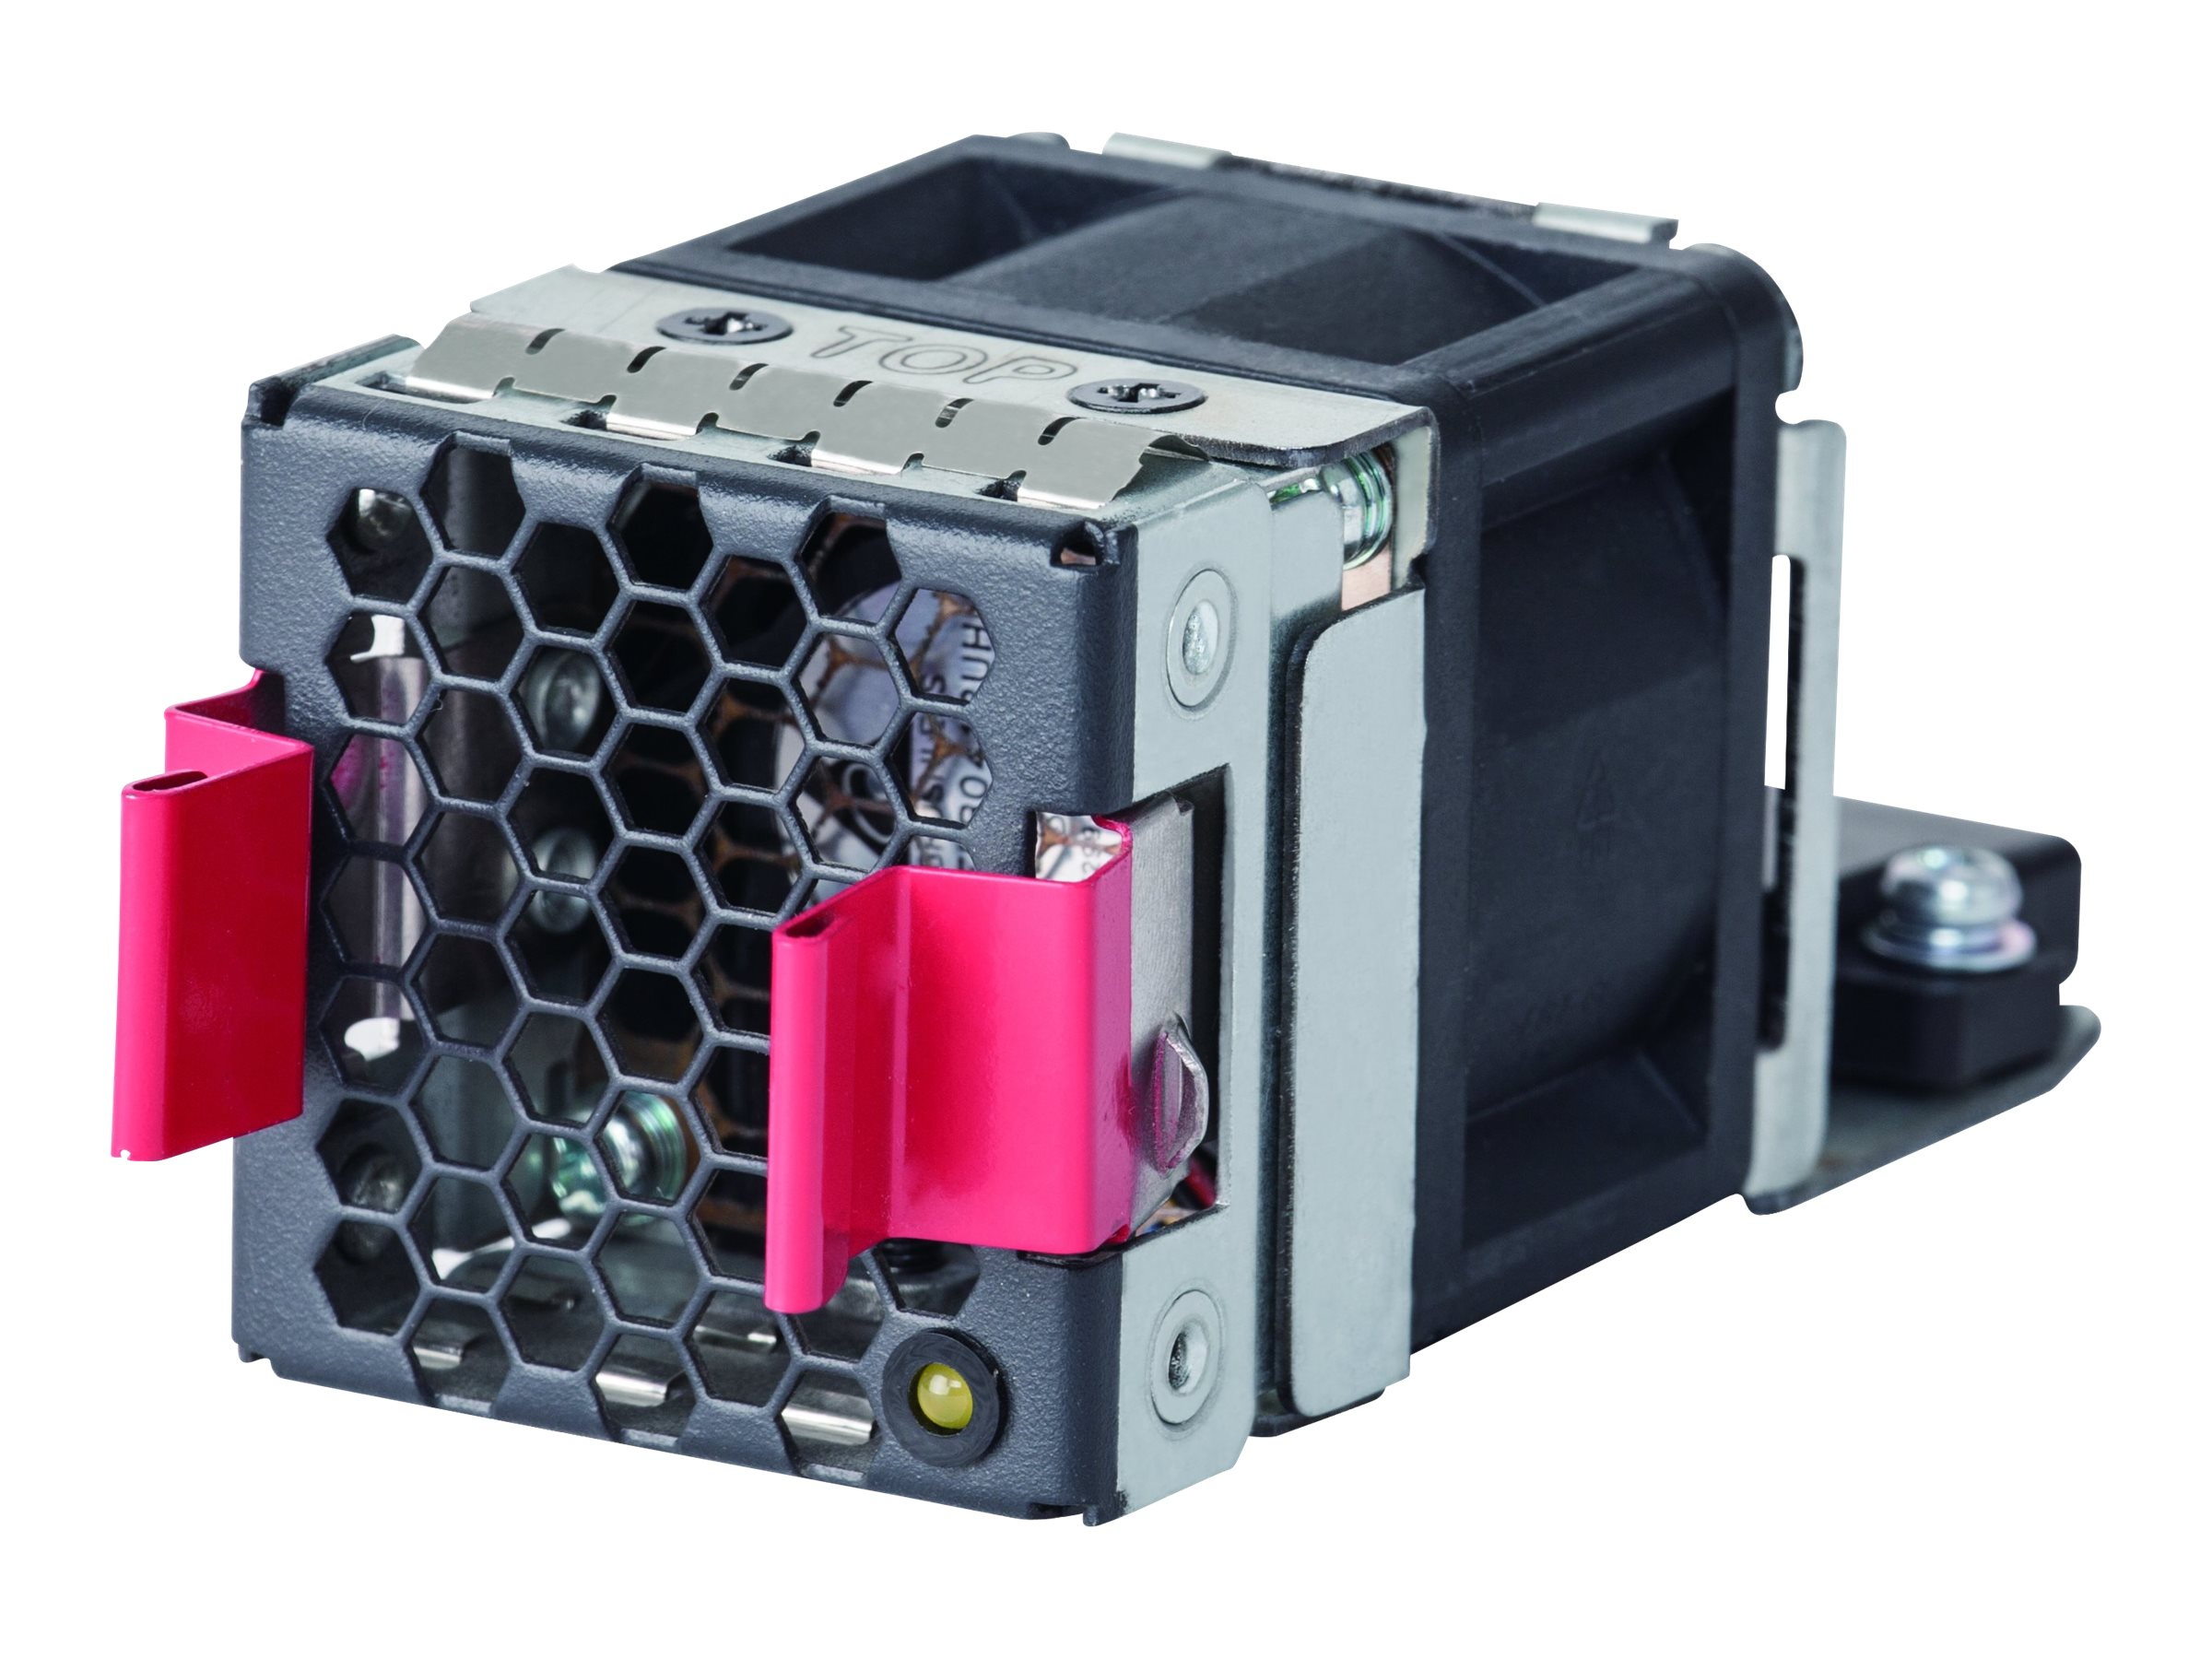 HPE X712 Back to Front Airflow High Volume 2 Fan Tray - network device fan tray